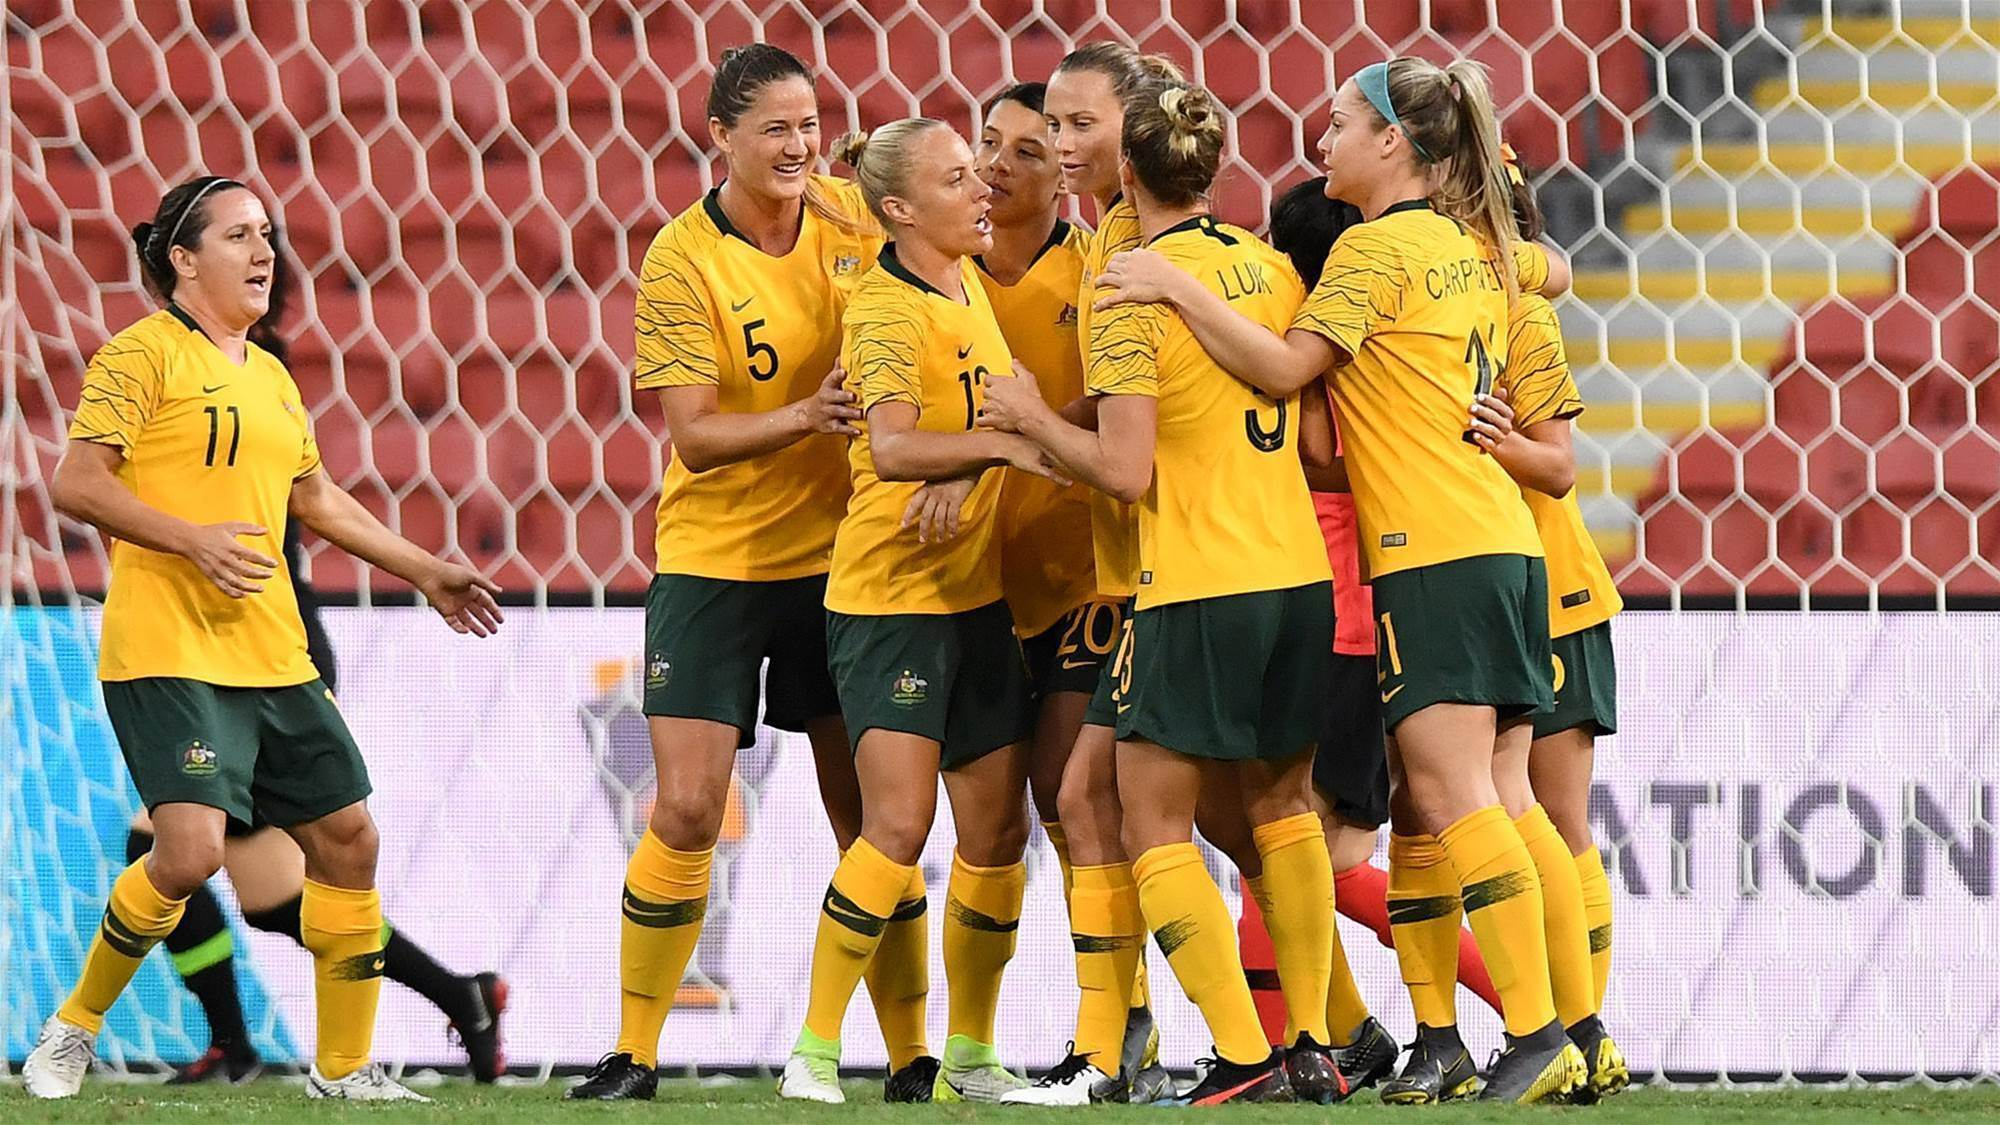 Matildas out do Korea Republic in Brisbane return